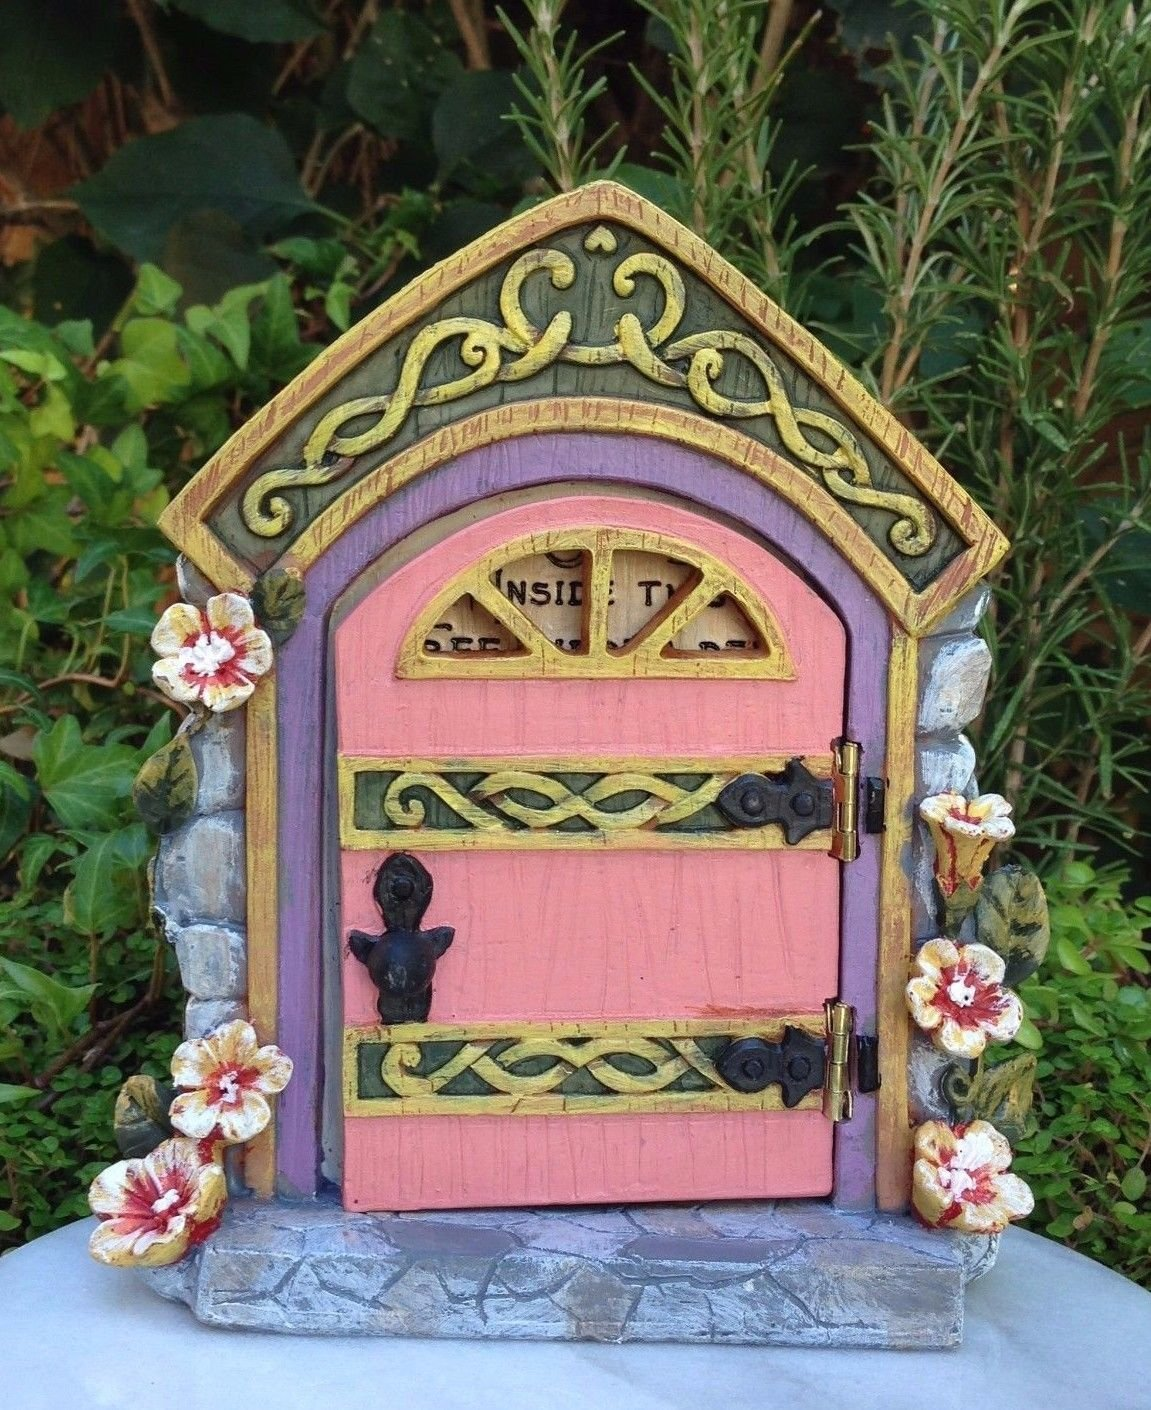 Miniature Dollhouse Fairy Garden Pink Floral Door Opens With Hidden Message